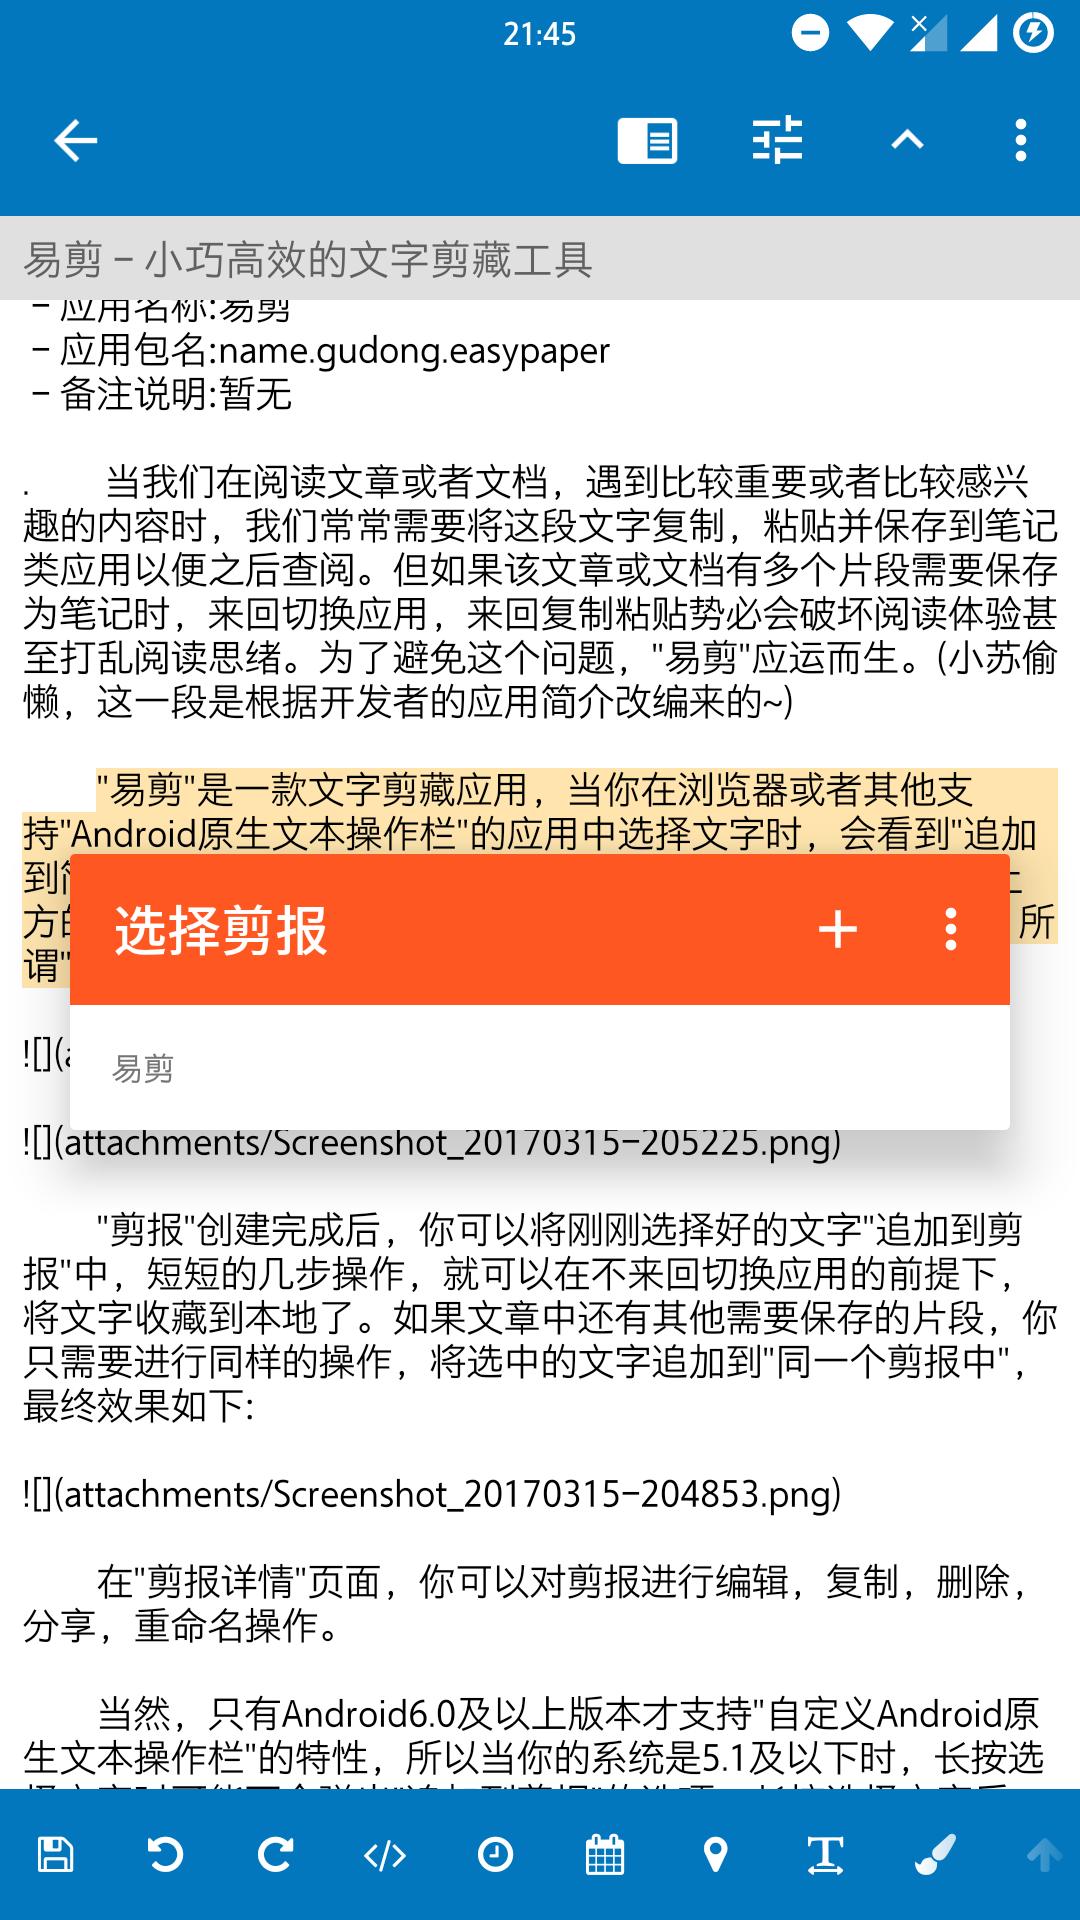 Screenshot_20170315-214520.png